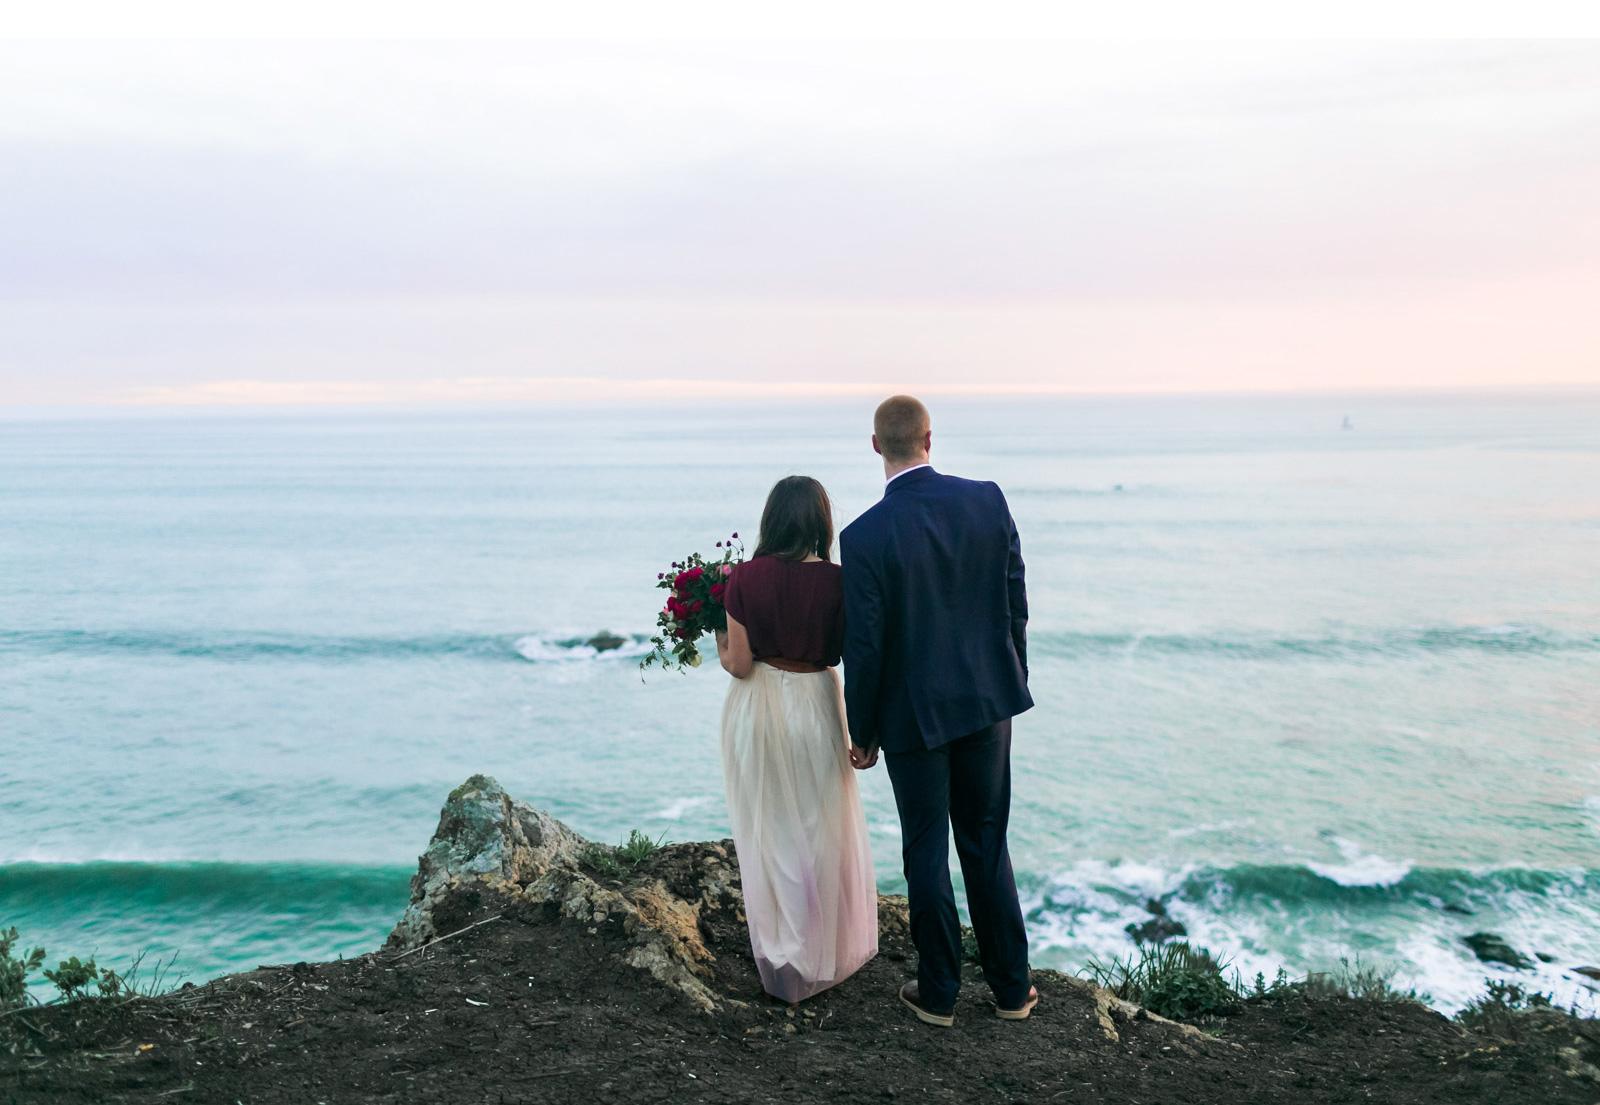 Central-Coast-Wedding-Photographer-Natalie-Schutt-Photography_01.jpg